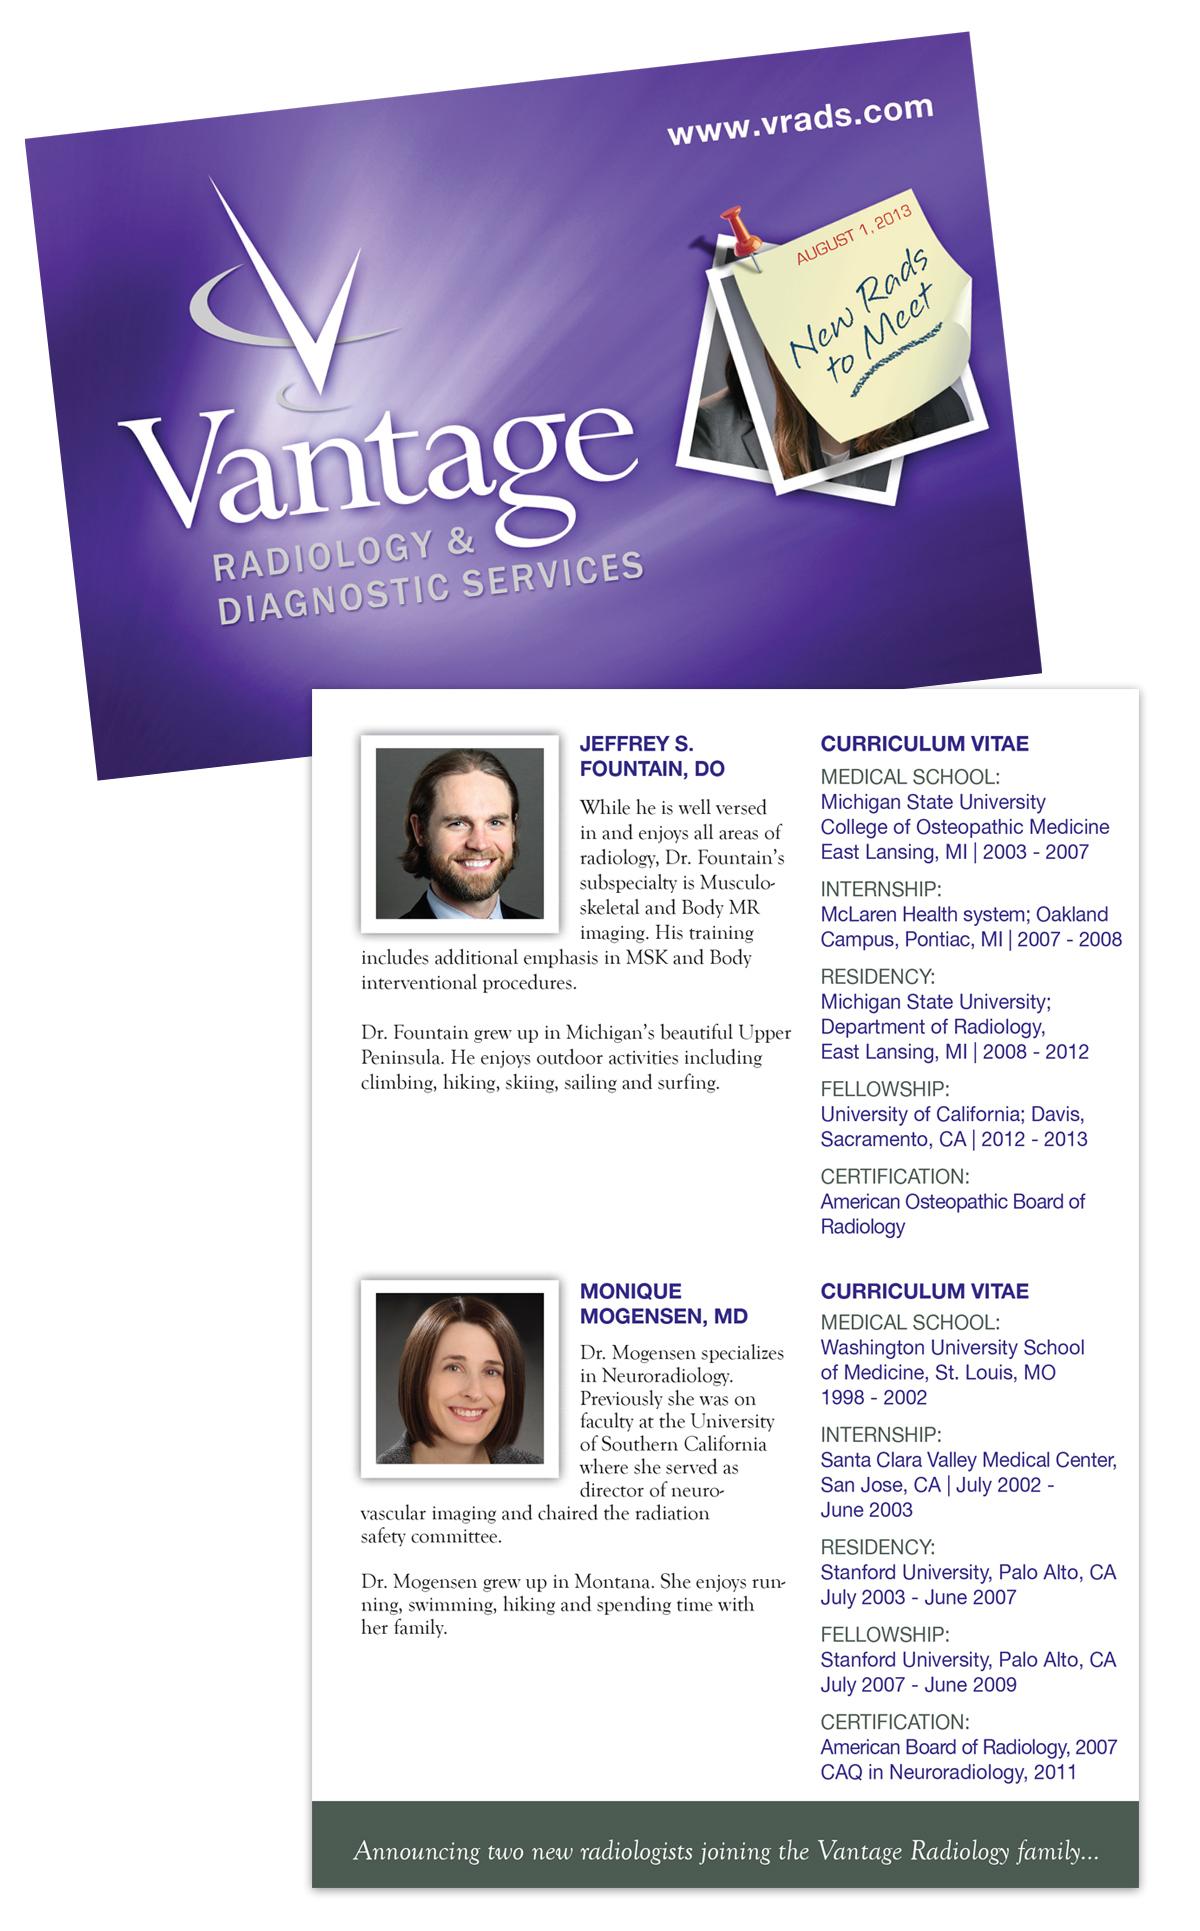 Tamara Vileta - Vantage Radiology / Rebranding